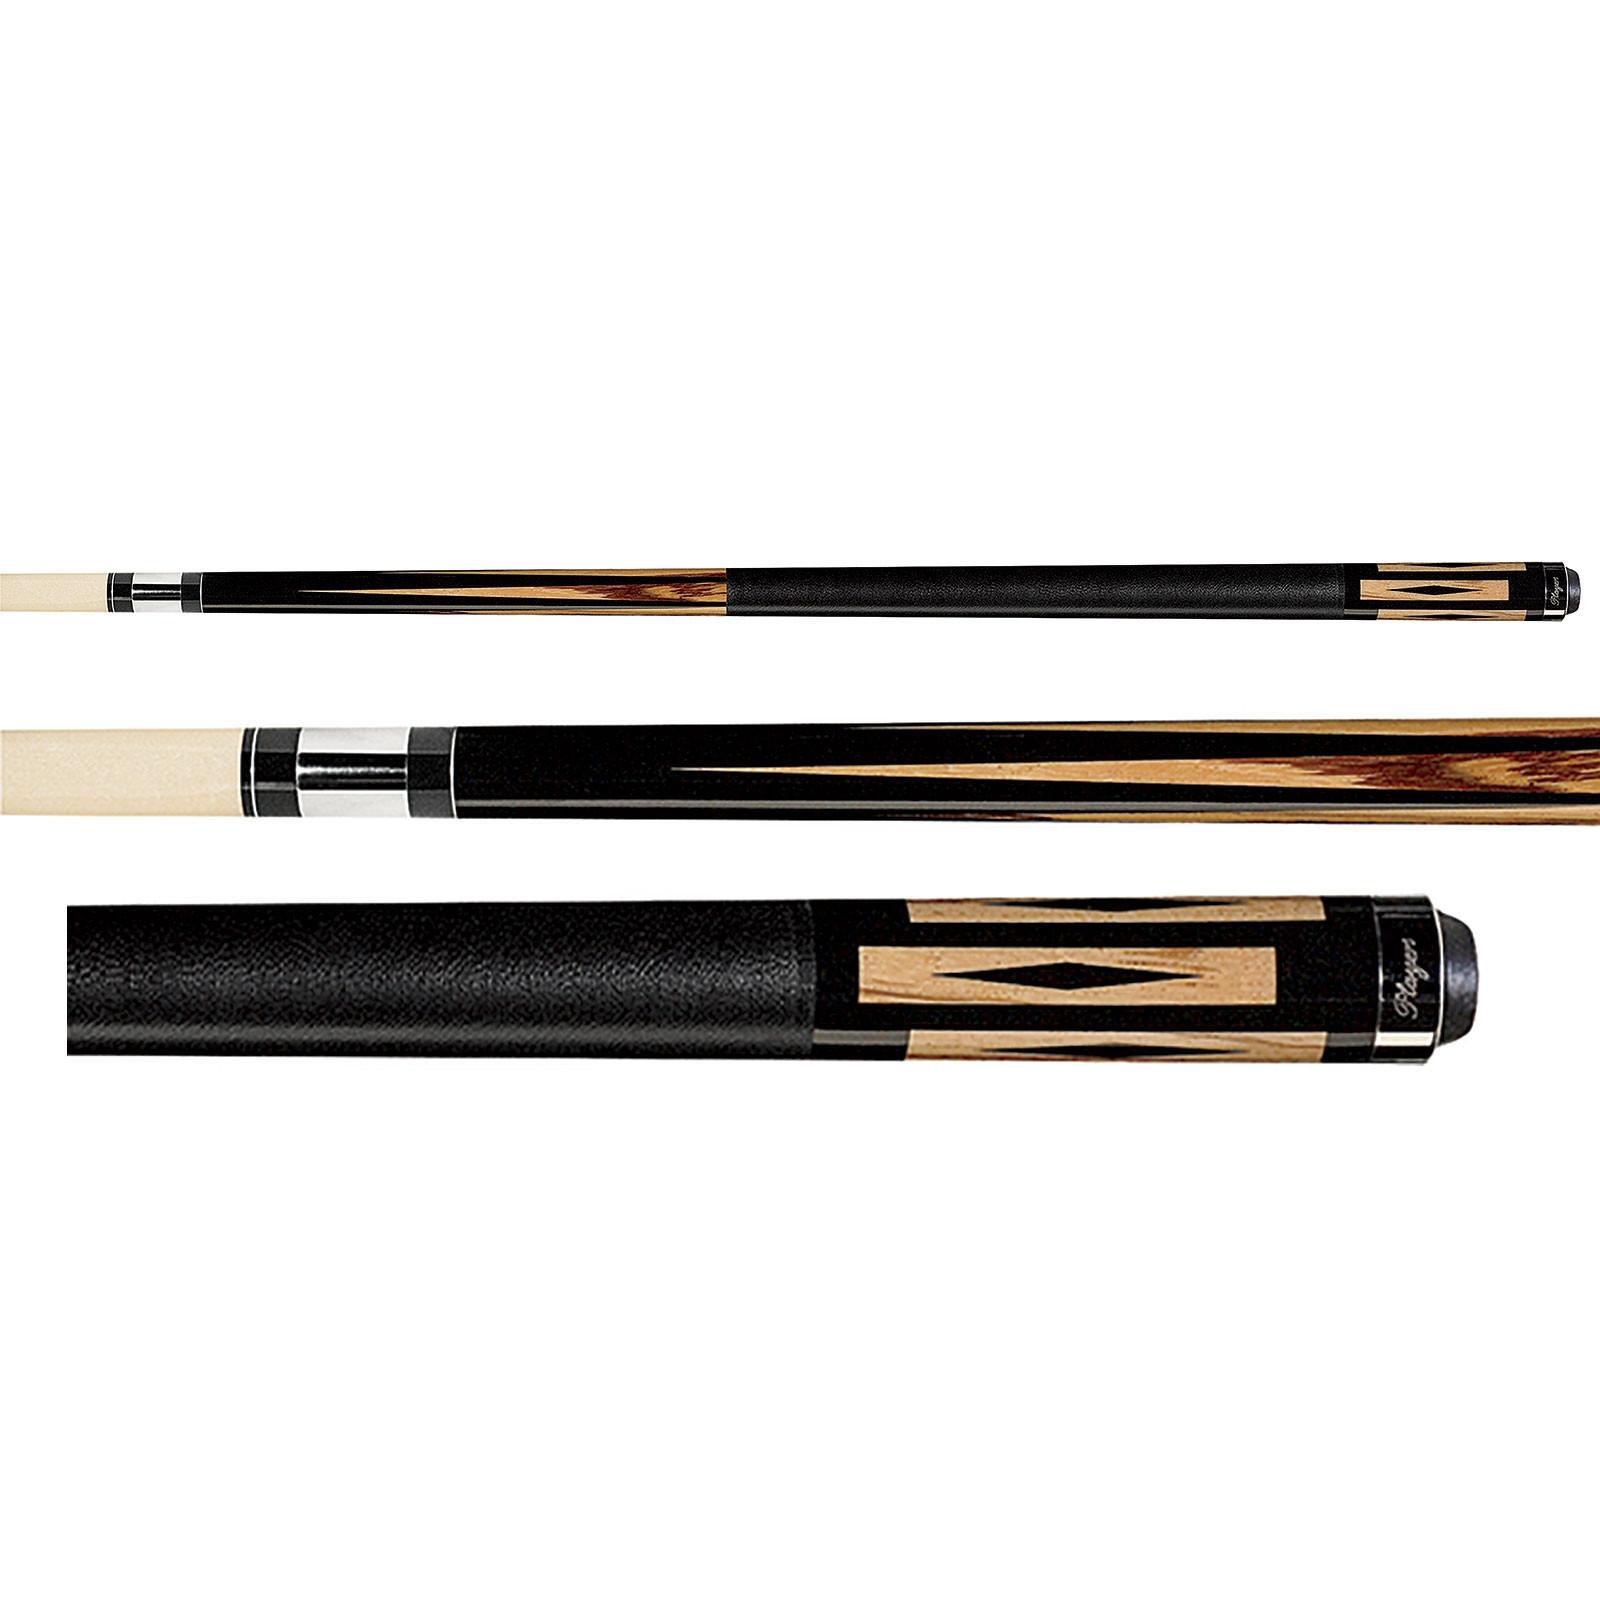 Players E-2500 Exotic Zebrawood Pool Cue Stick